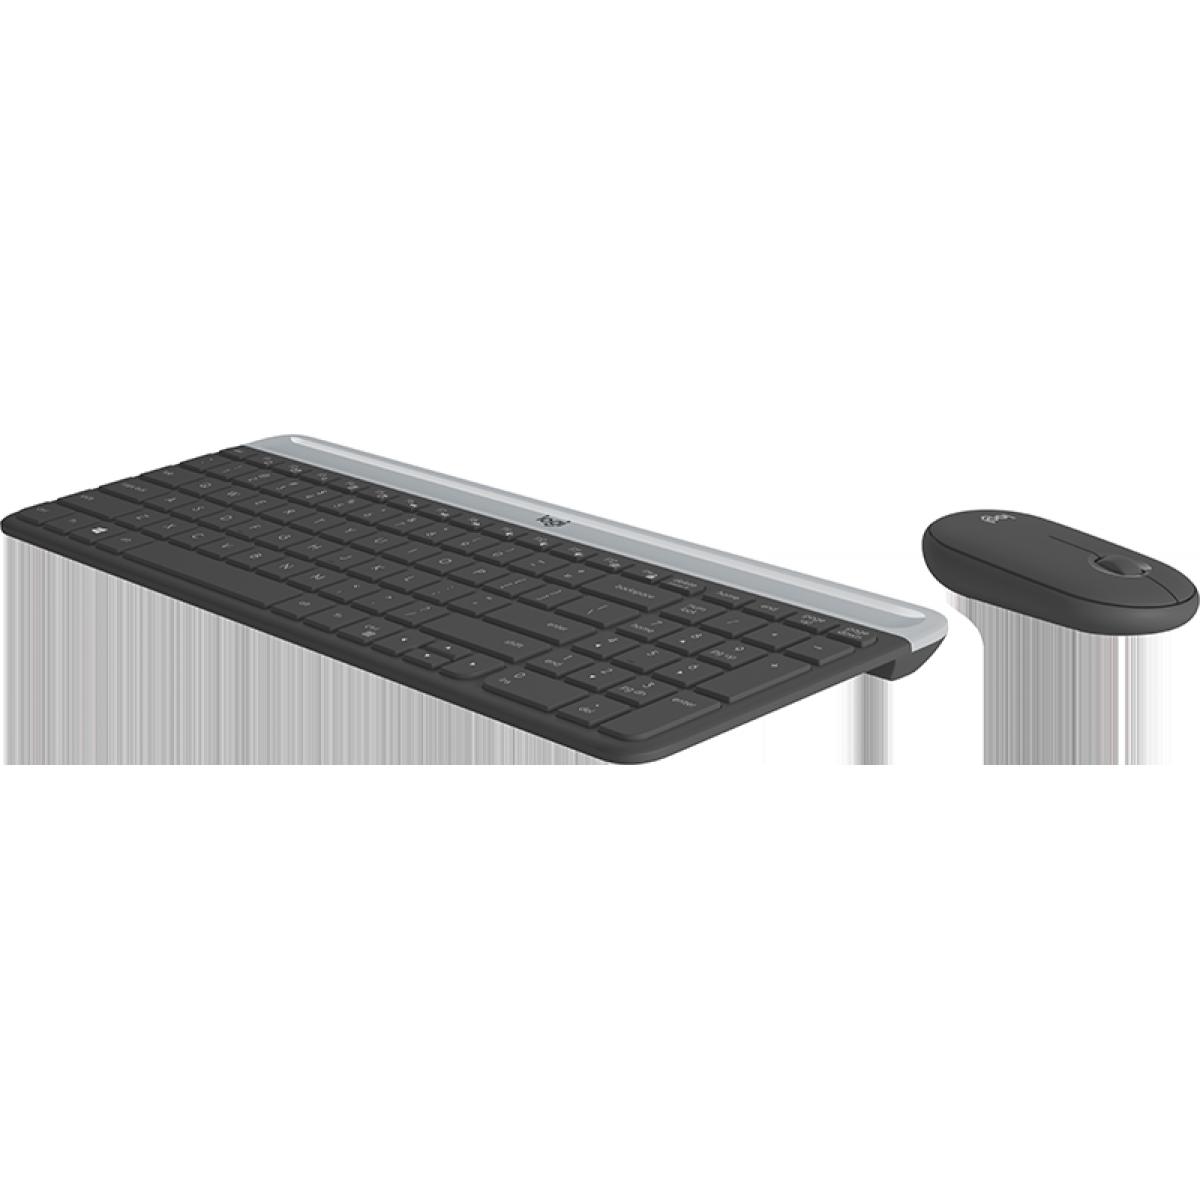 Combo Teclado e Mouse Sem fio Logitech MK470, Wireless, Slim, Black 920-009268